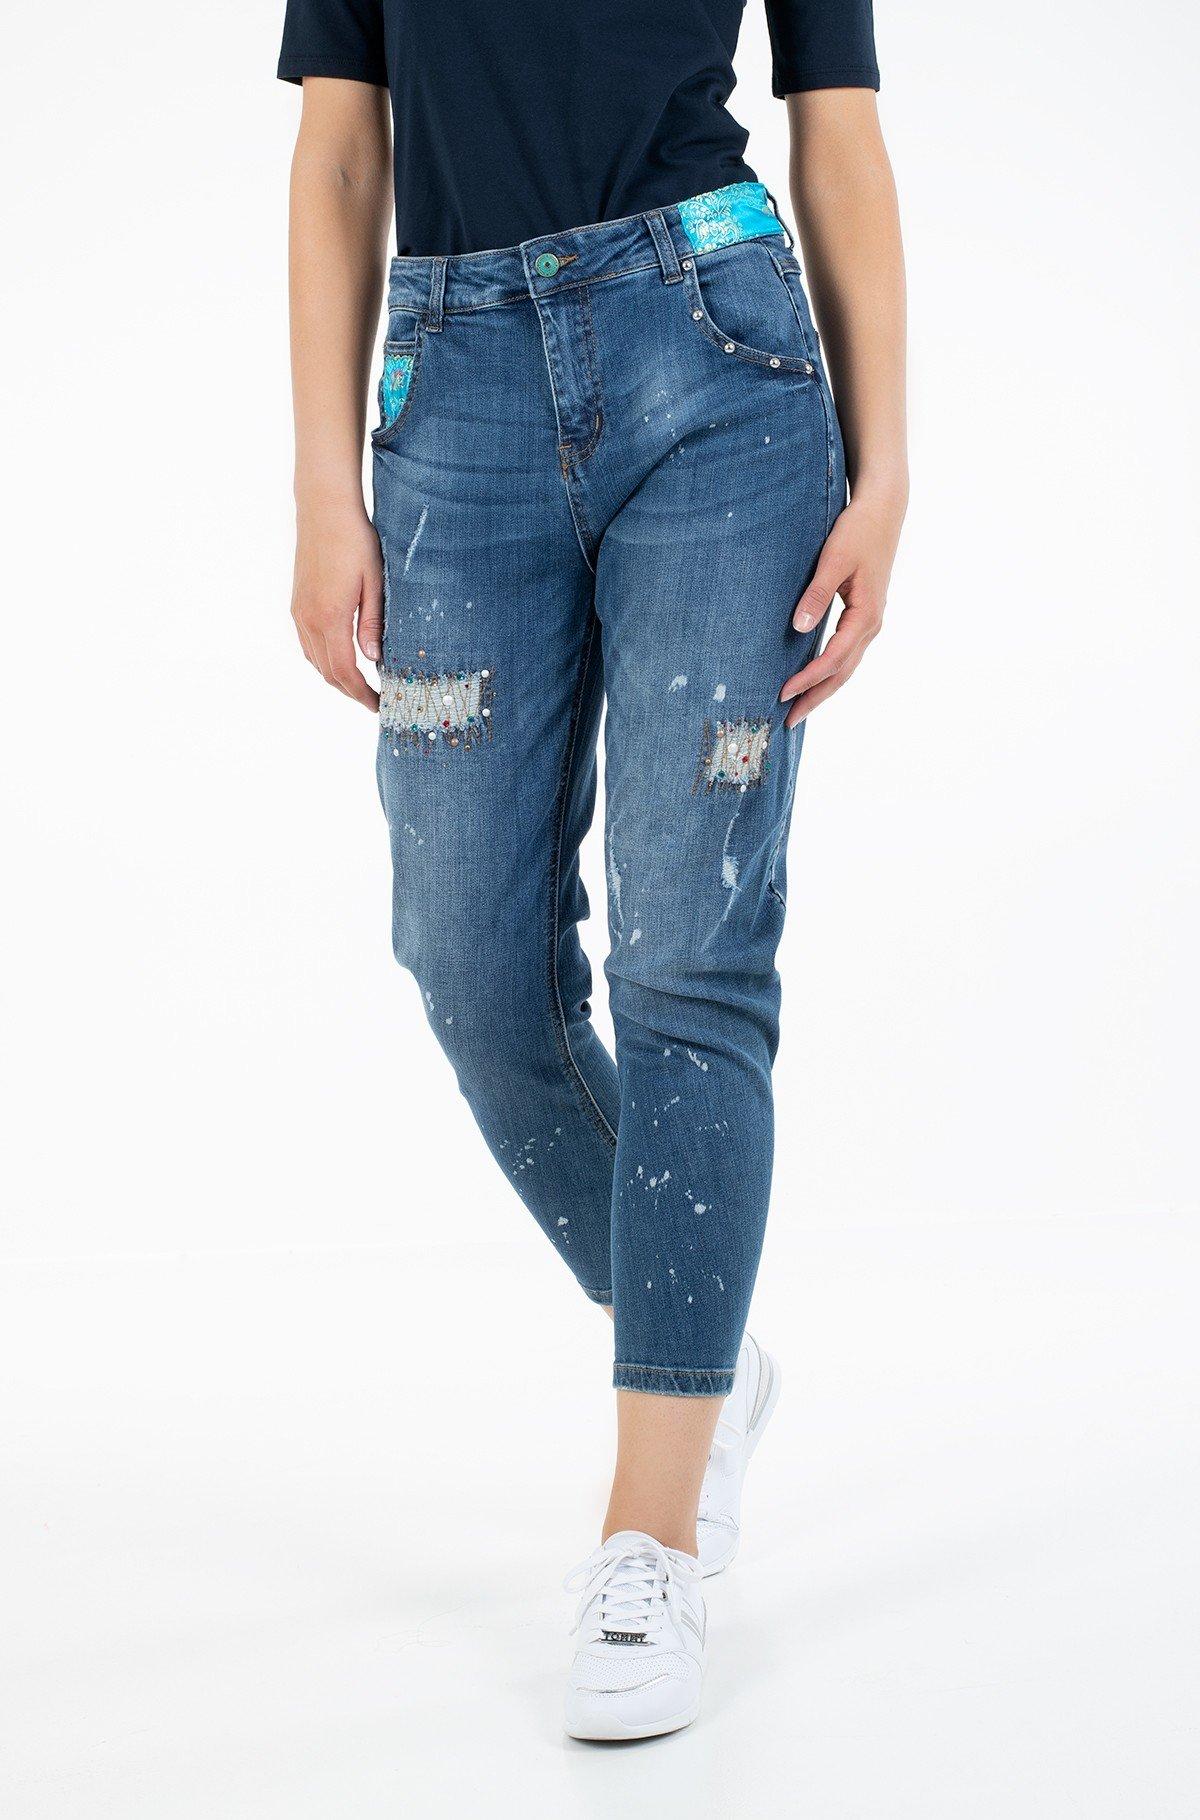 Džinsinės kelnės 20SWDD16 DENIM_LENNON-full-1